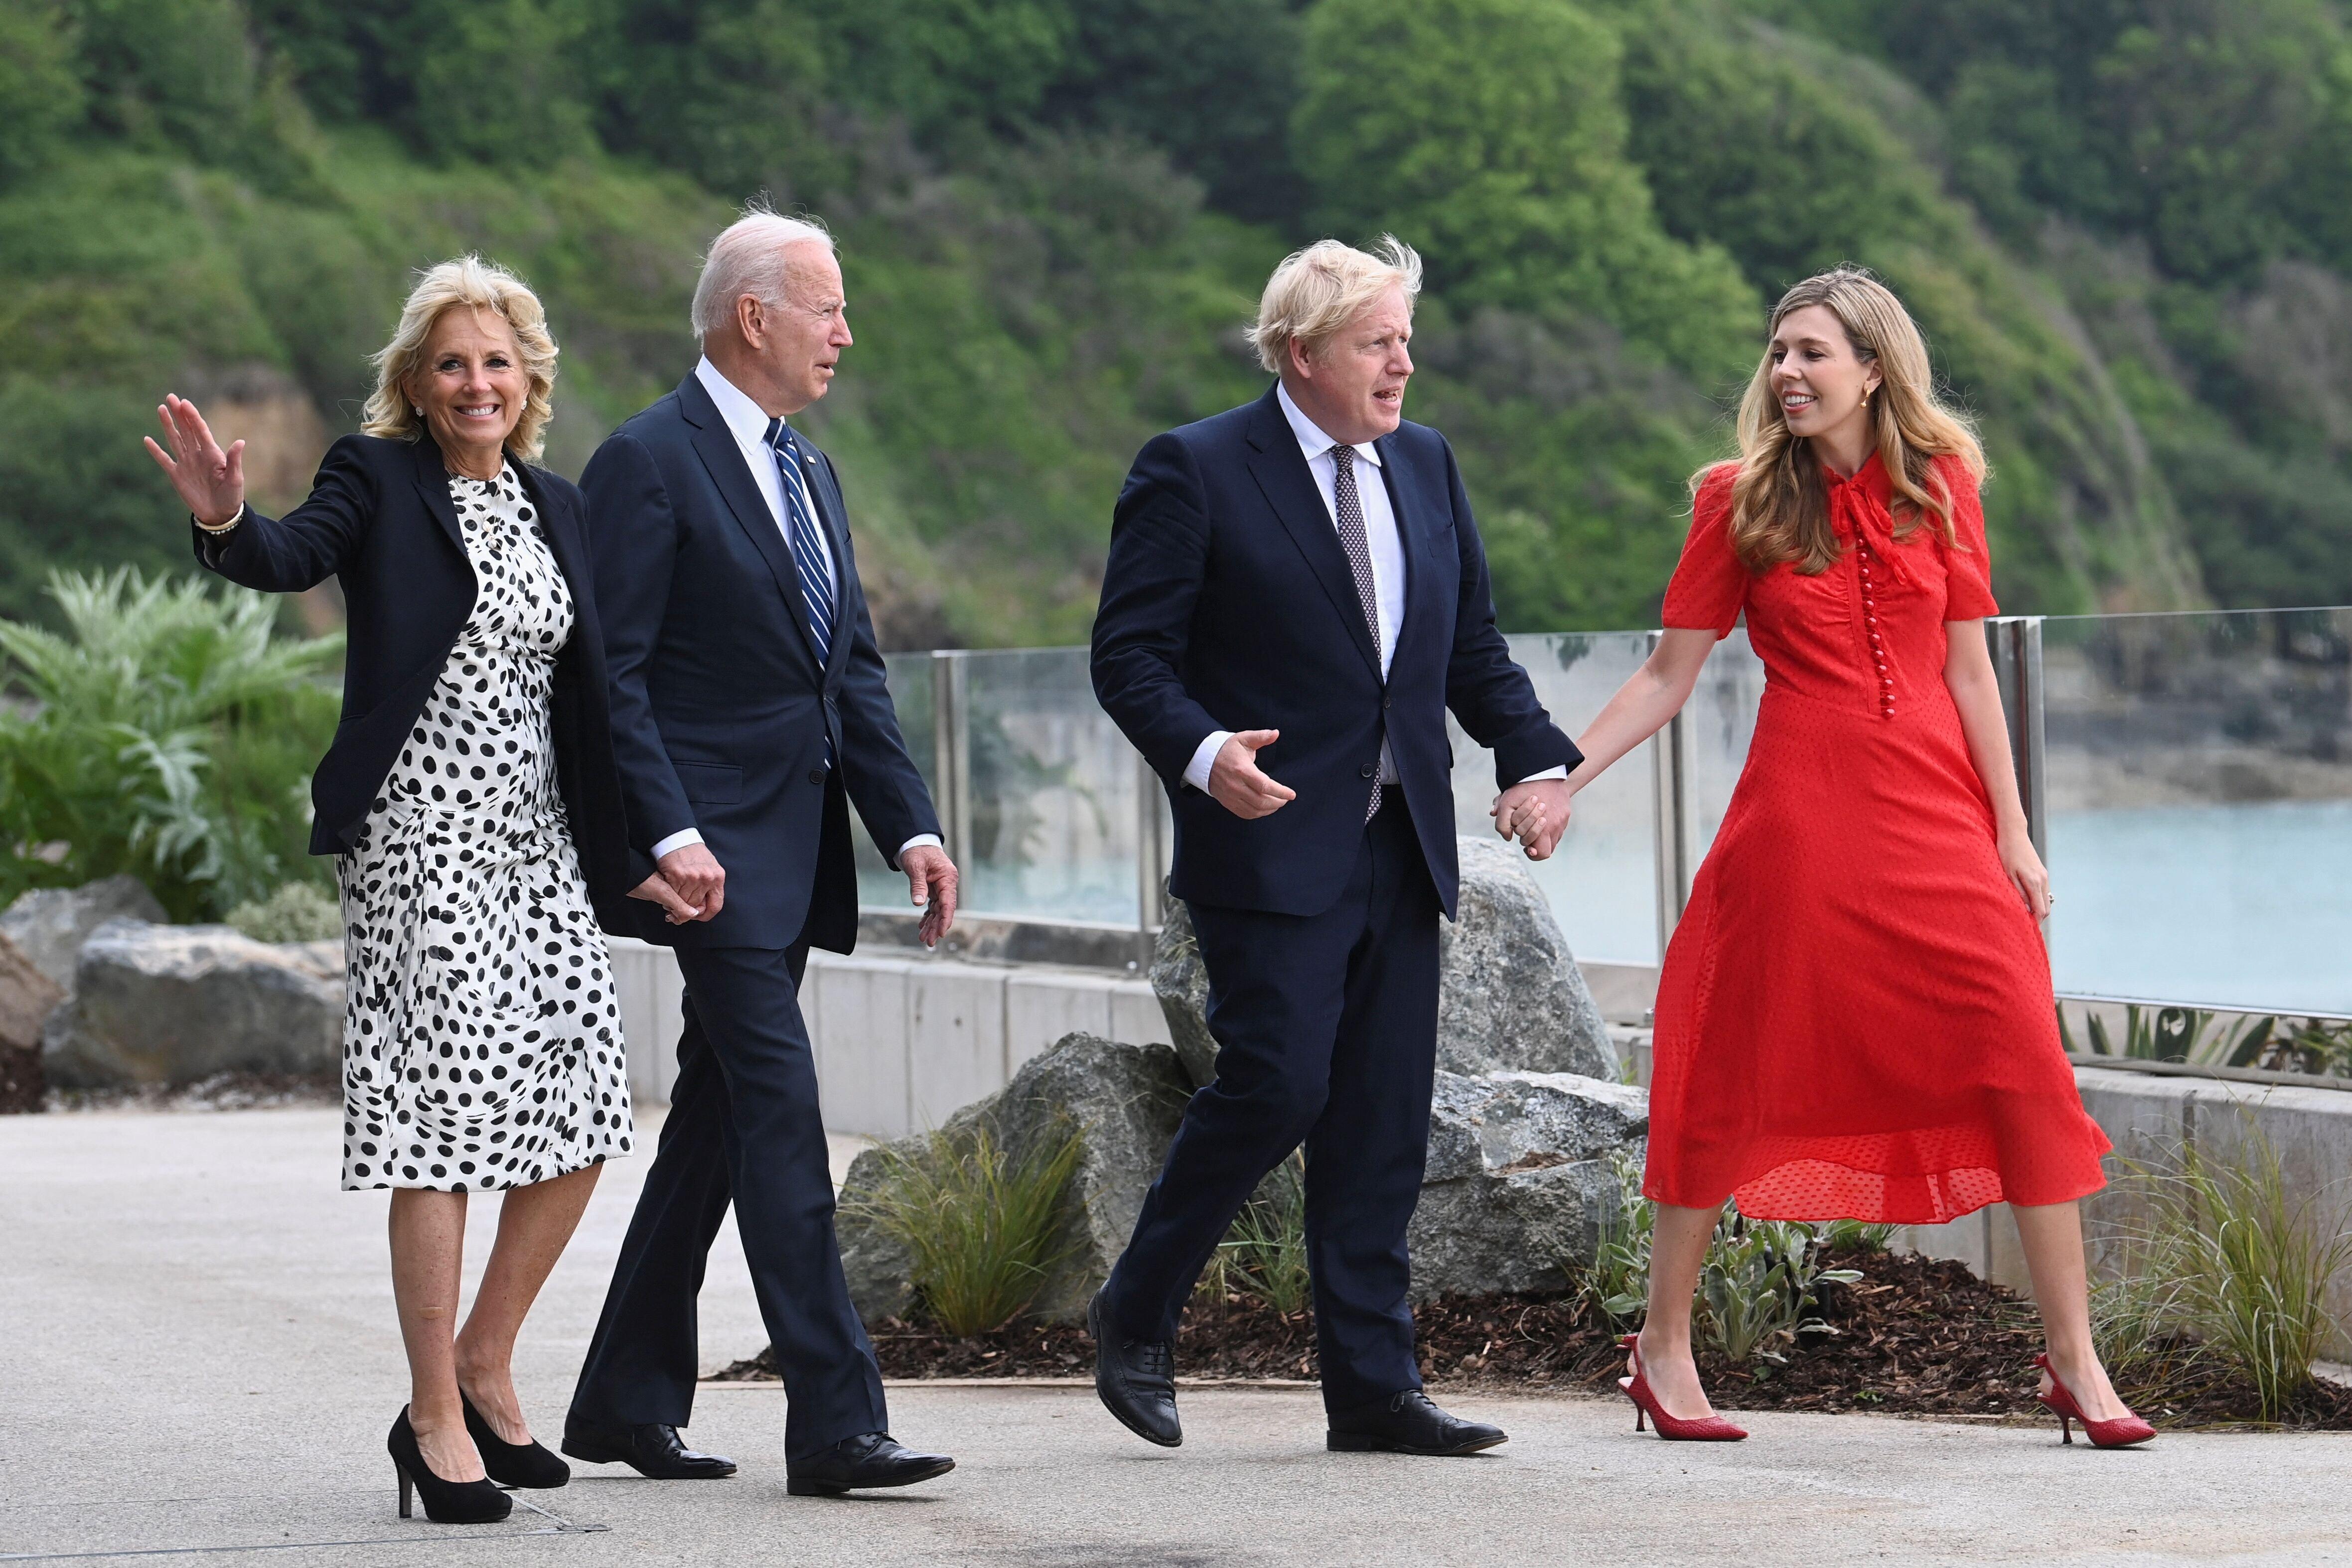 Sea Shanties, Hot Rum And The Queen: How Boris Johnson Will Woo G7 Leaders